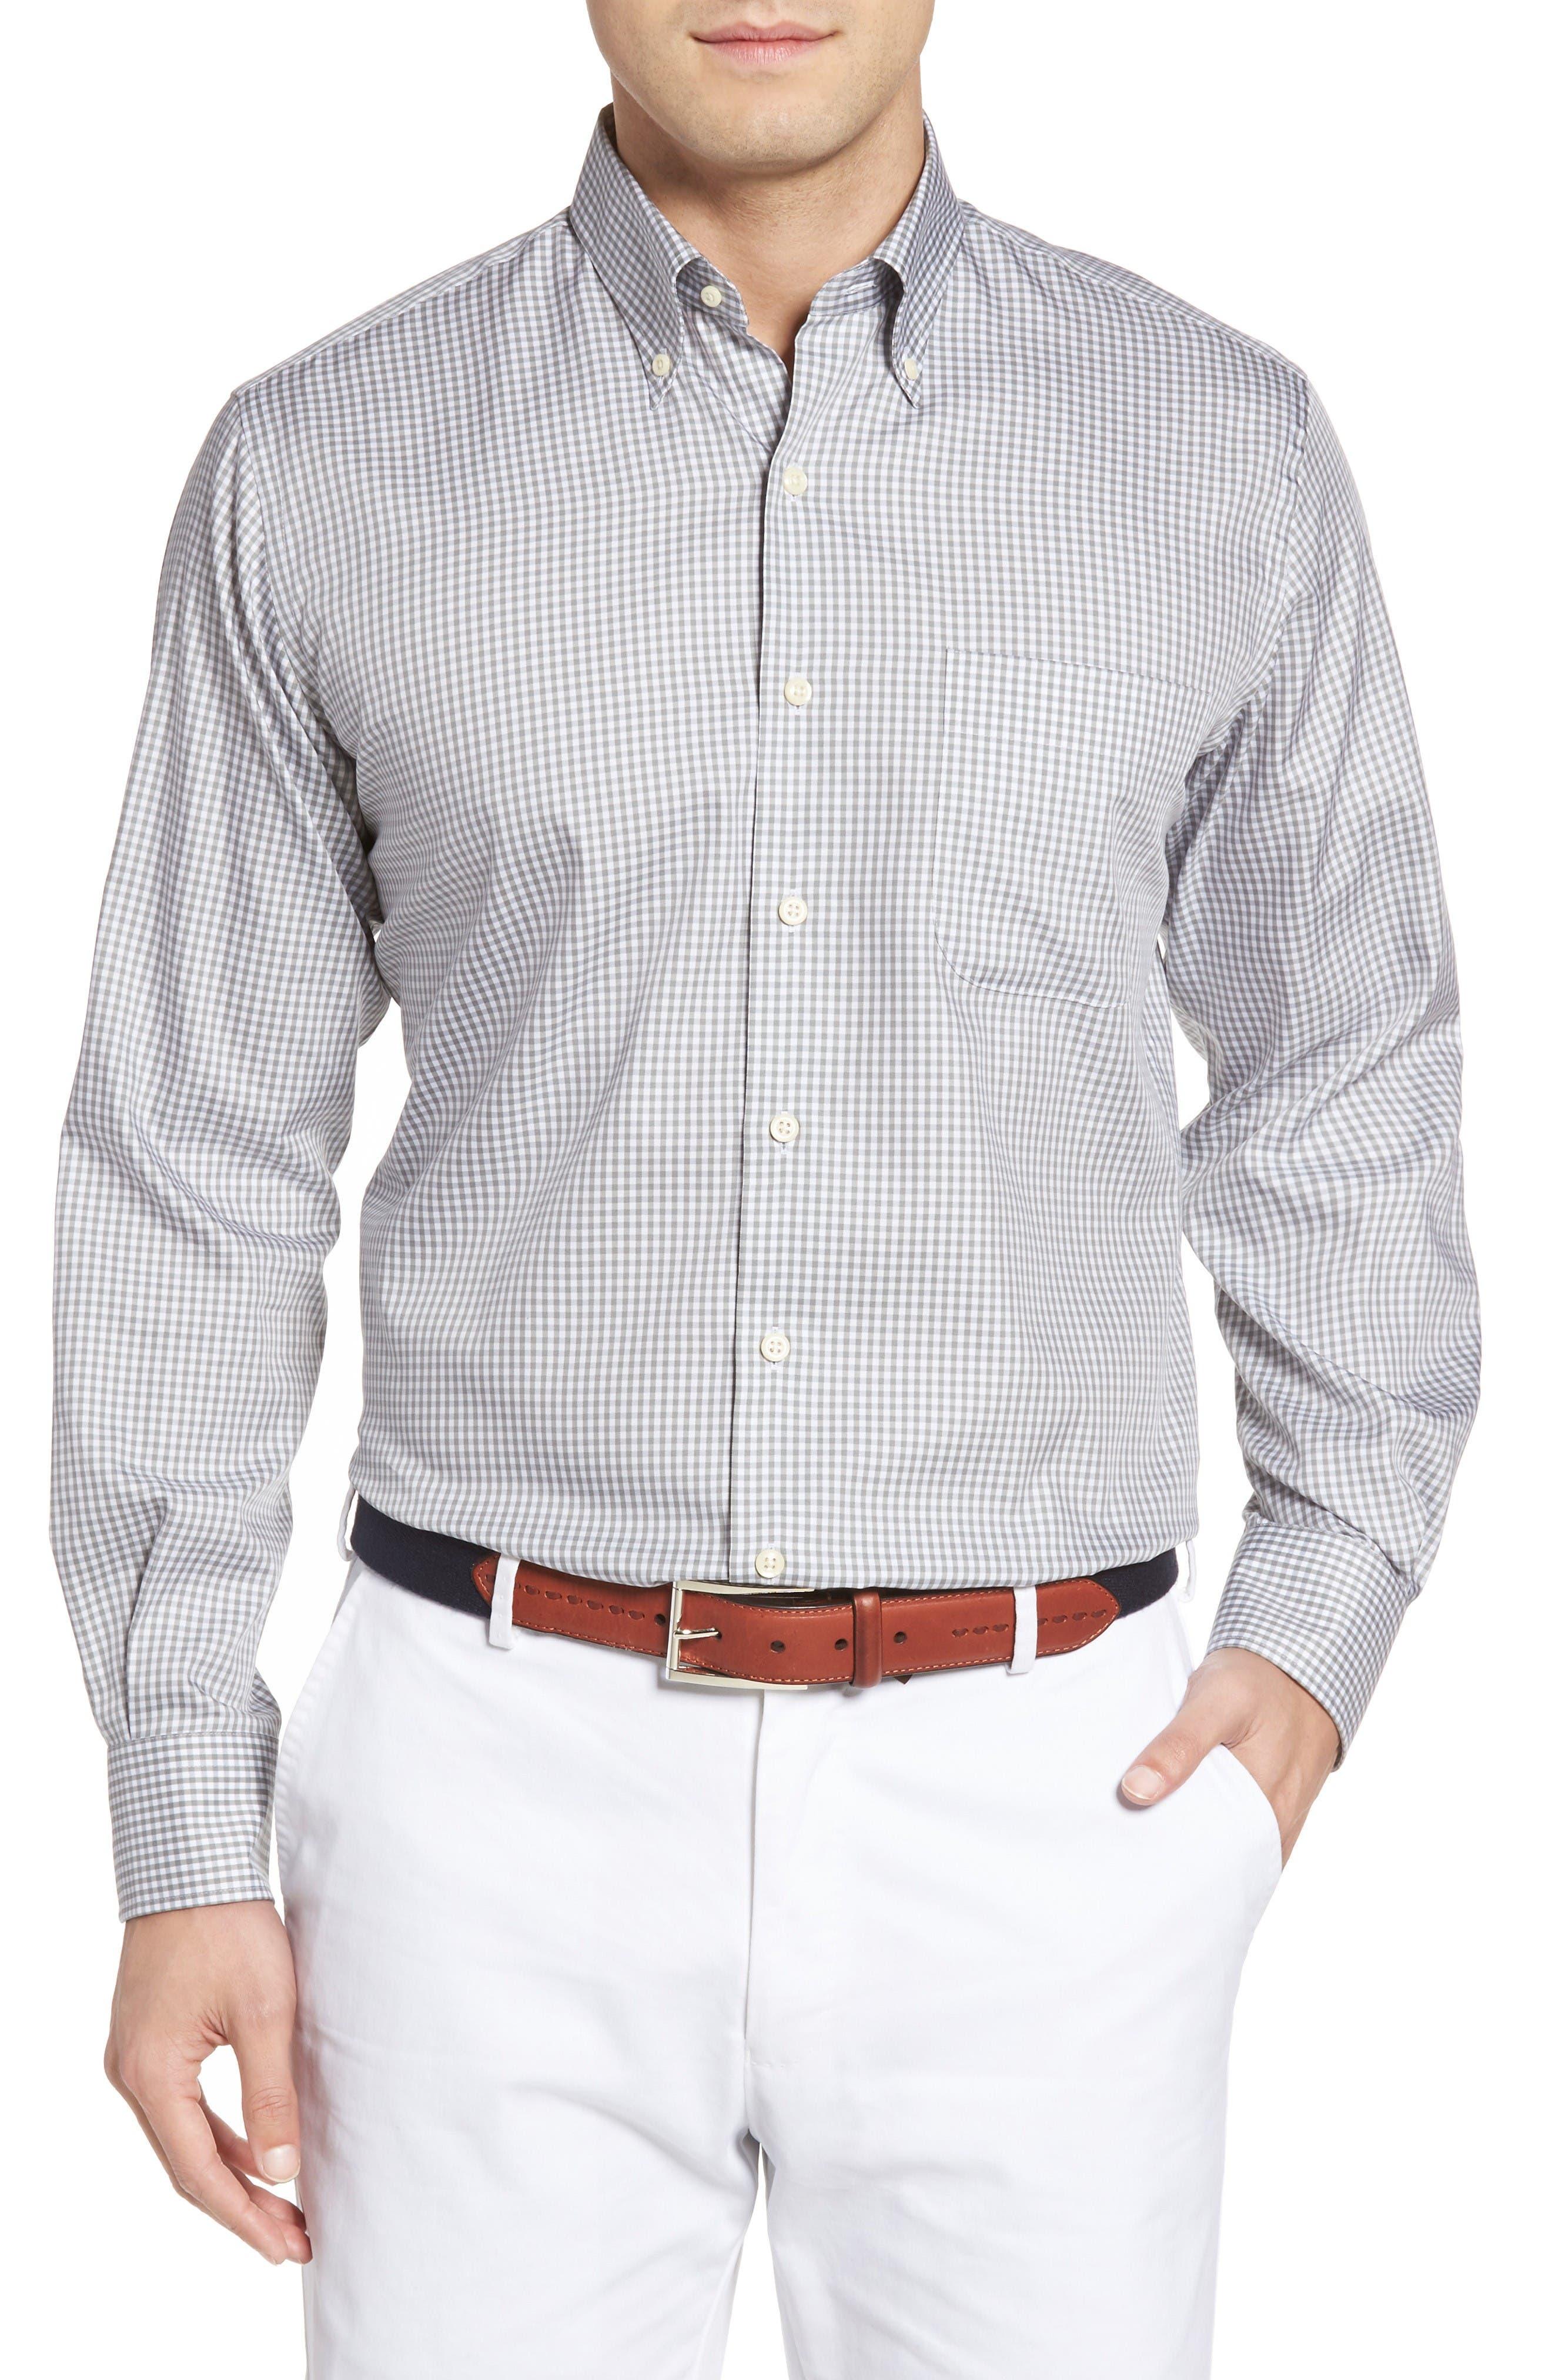 Main Image - Peter Millar Crown Soft Gingham Regular Fit Sport Shirt